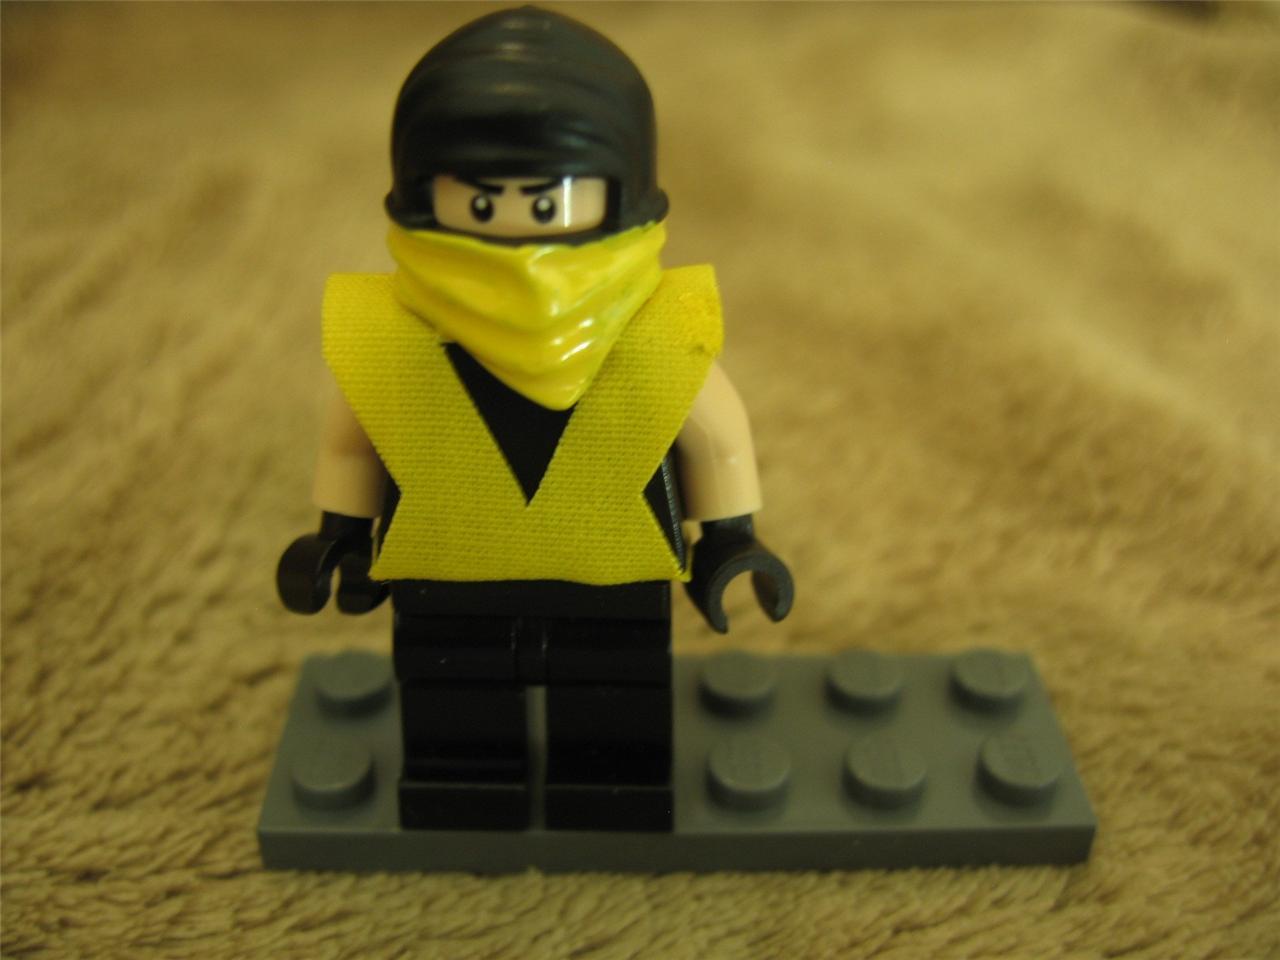 Lego Minifig- MK Mortal Kombat Scorpion -Custom Minifigure ...  Lego Minifig- M...